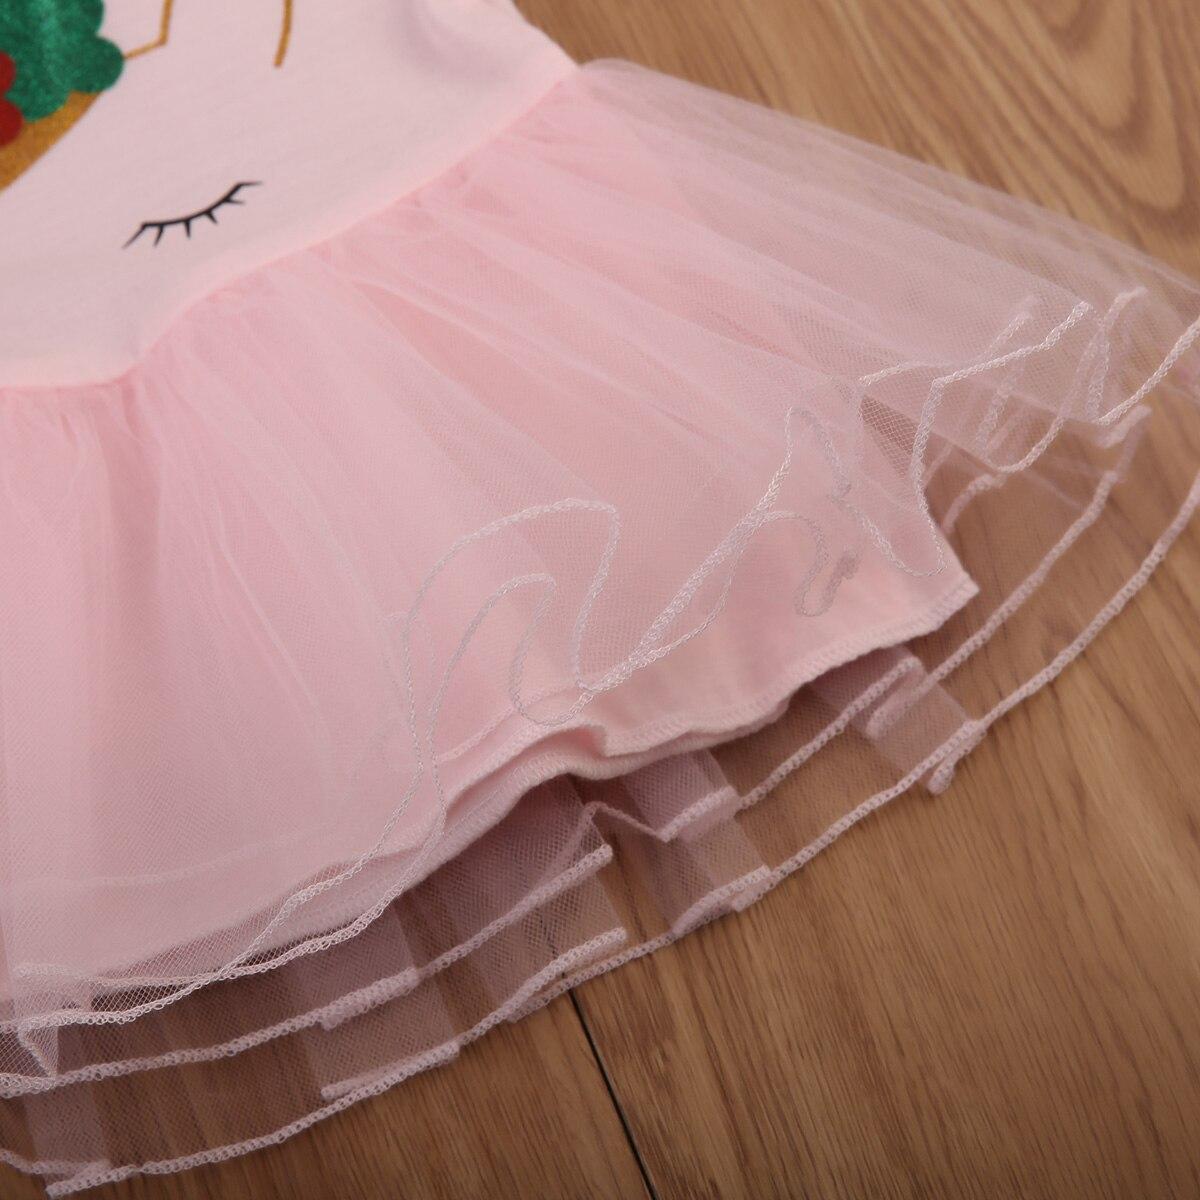 Vistoso Vestidos De Bodas Cute Friso - Colección de Vestidos de Boda ...